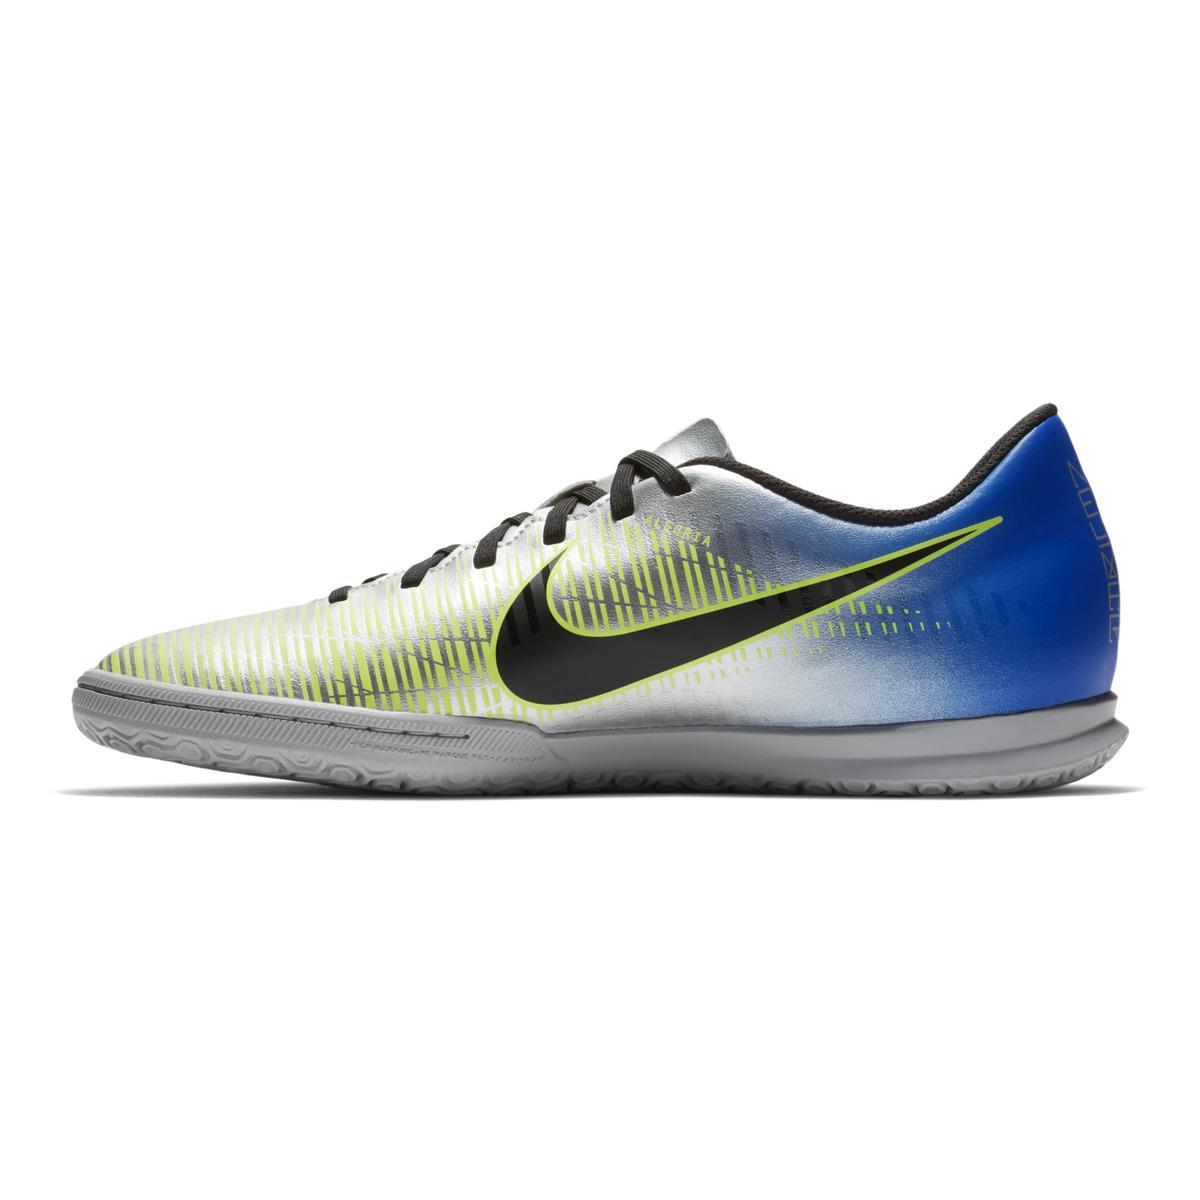 sports shoes b150b 423b9 nike -Blue-Silver-Neymar-Jr-Indoor-Football-Boots-Mercurialx-Vortex-Iii-ic.jpeg